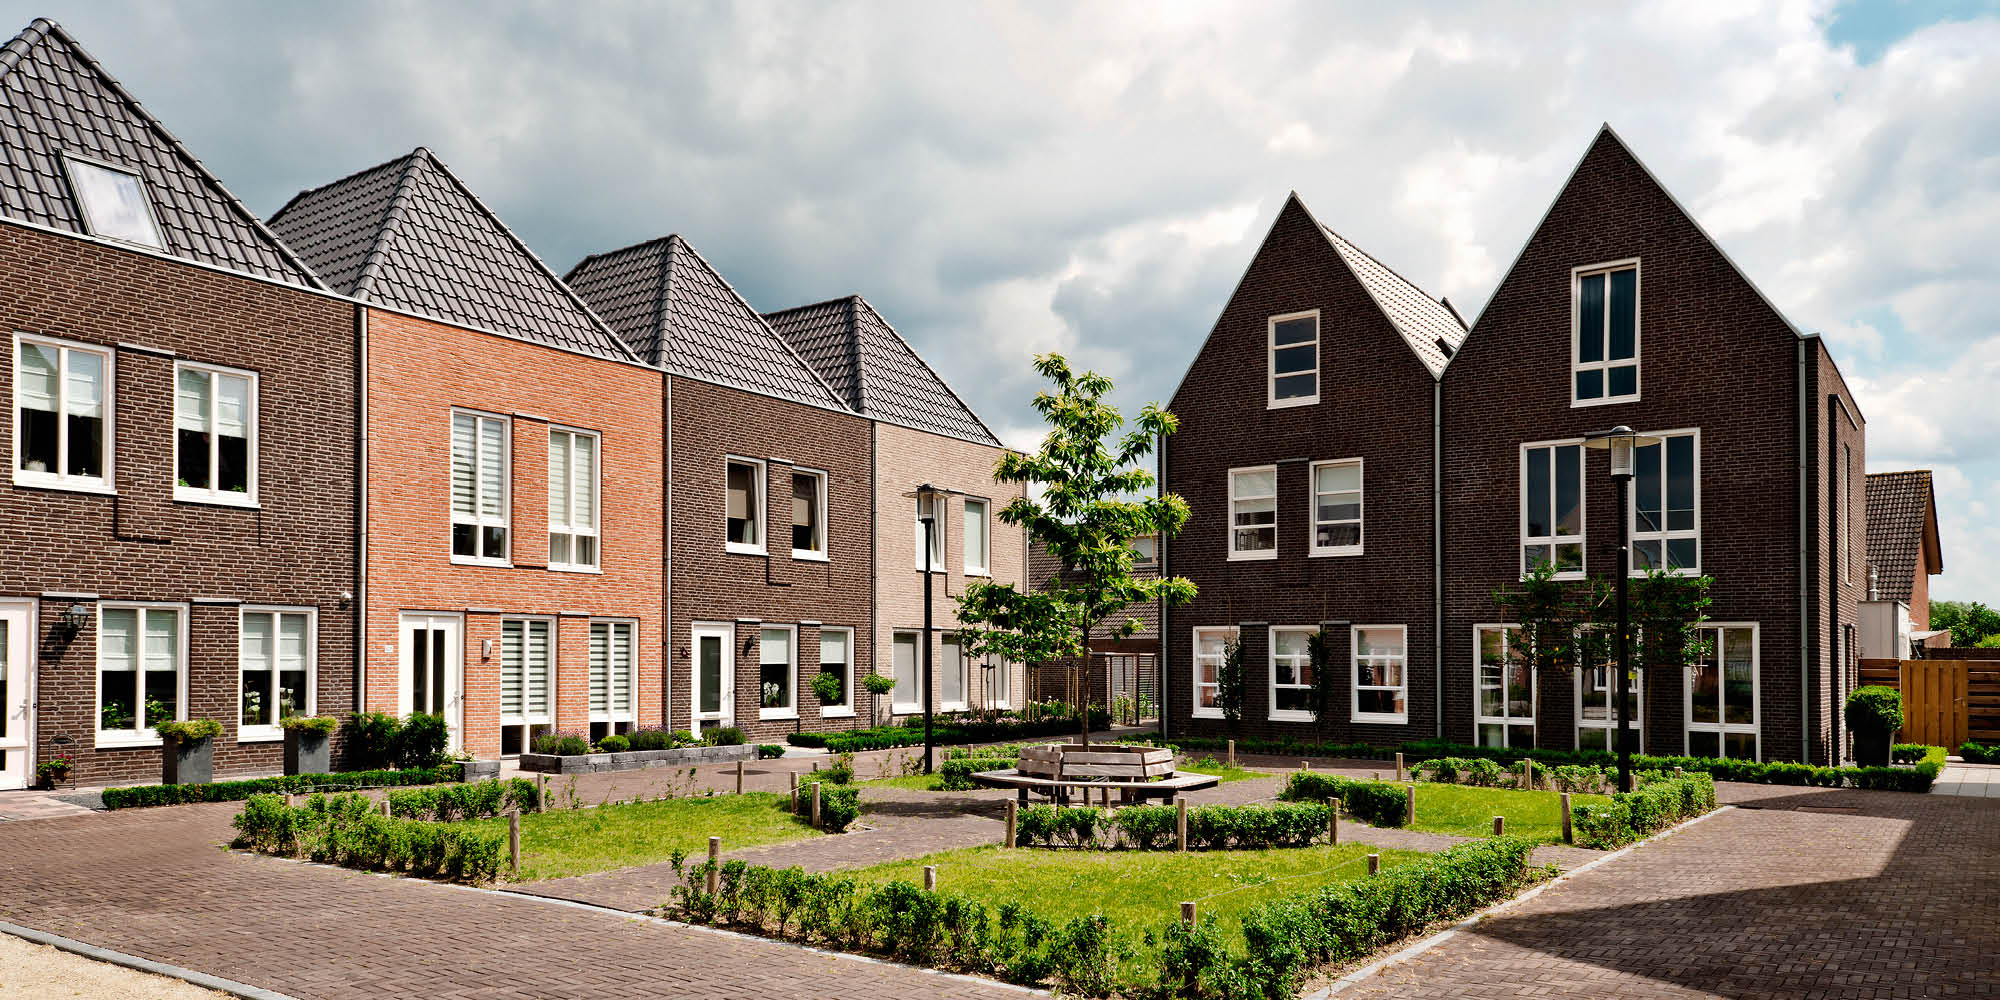 151-Leesonhof-Ederveen4